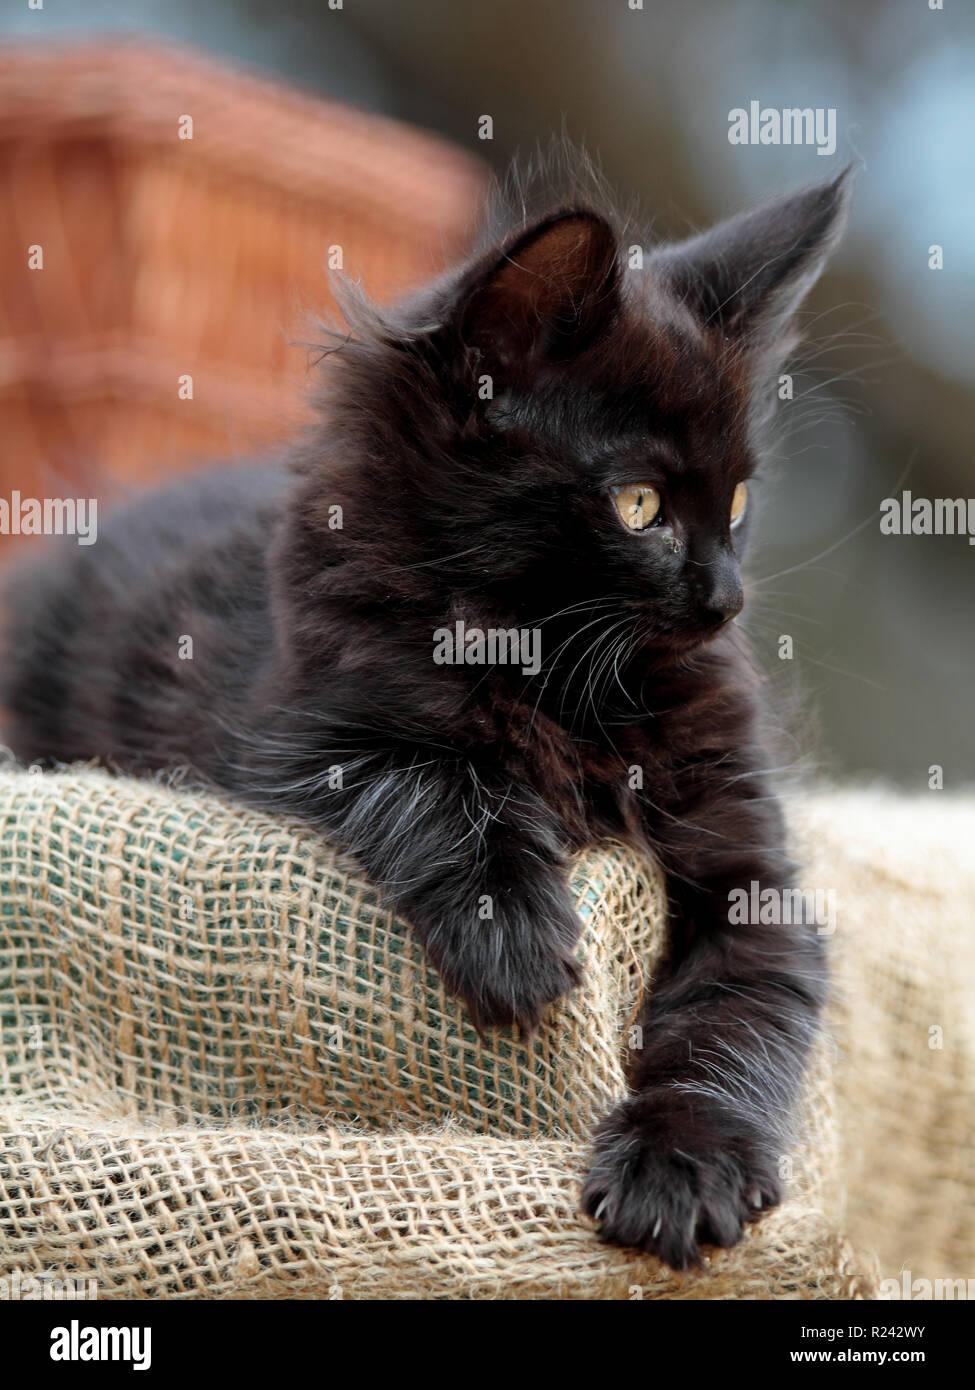 Sweet Black Norwegian Forest Cat Kitten Resting Outdoors Stock Photo Alamy